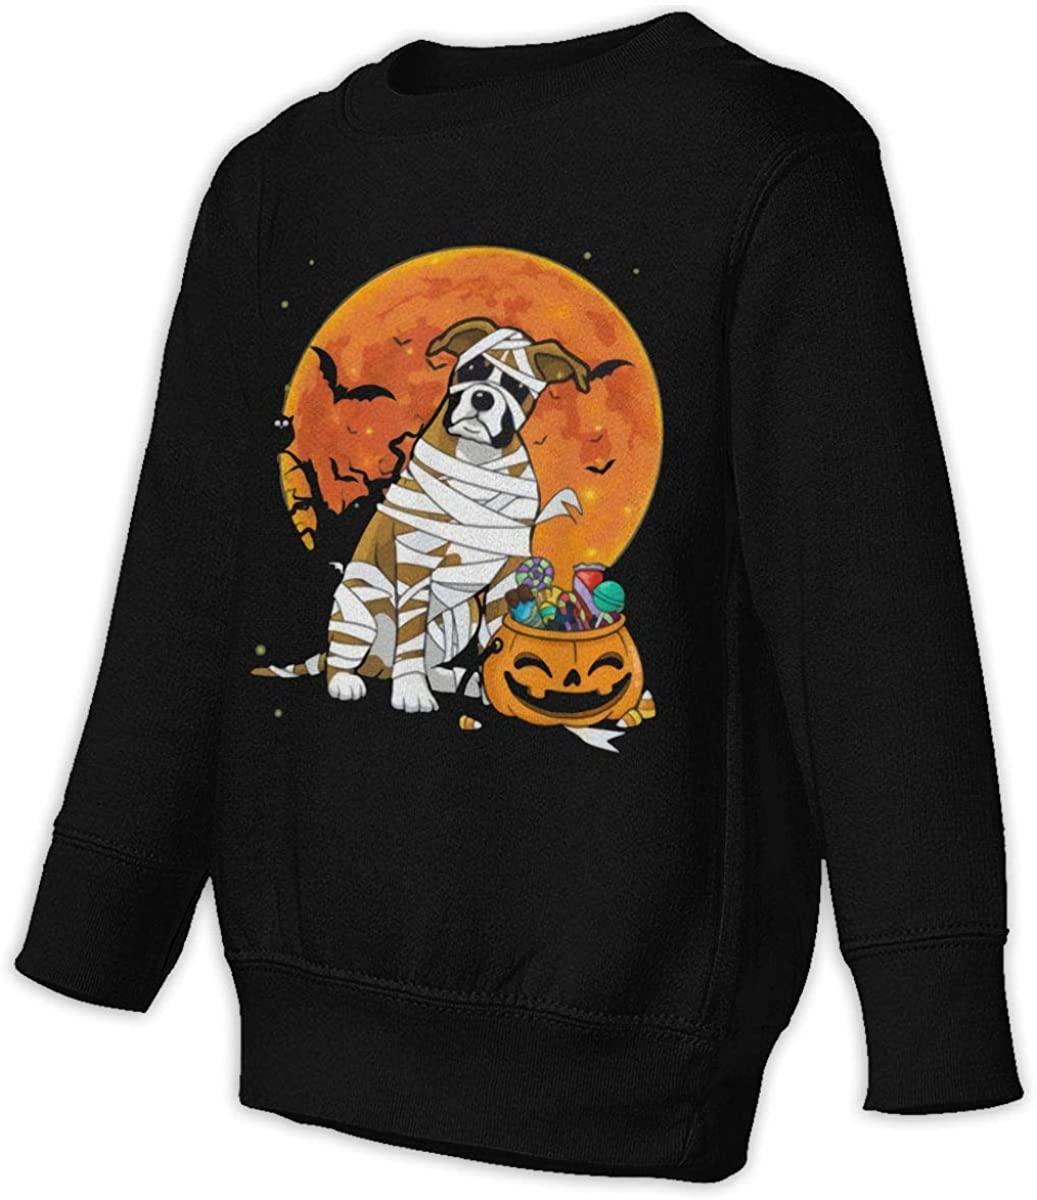 HUYAJGODGP-kiusdm Pumpkin Halloween Unisex Sweatshirt Youth Boy and Girls Pullover Sweatshirt Black